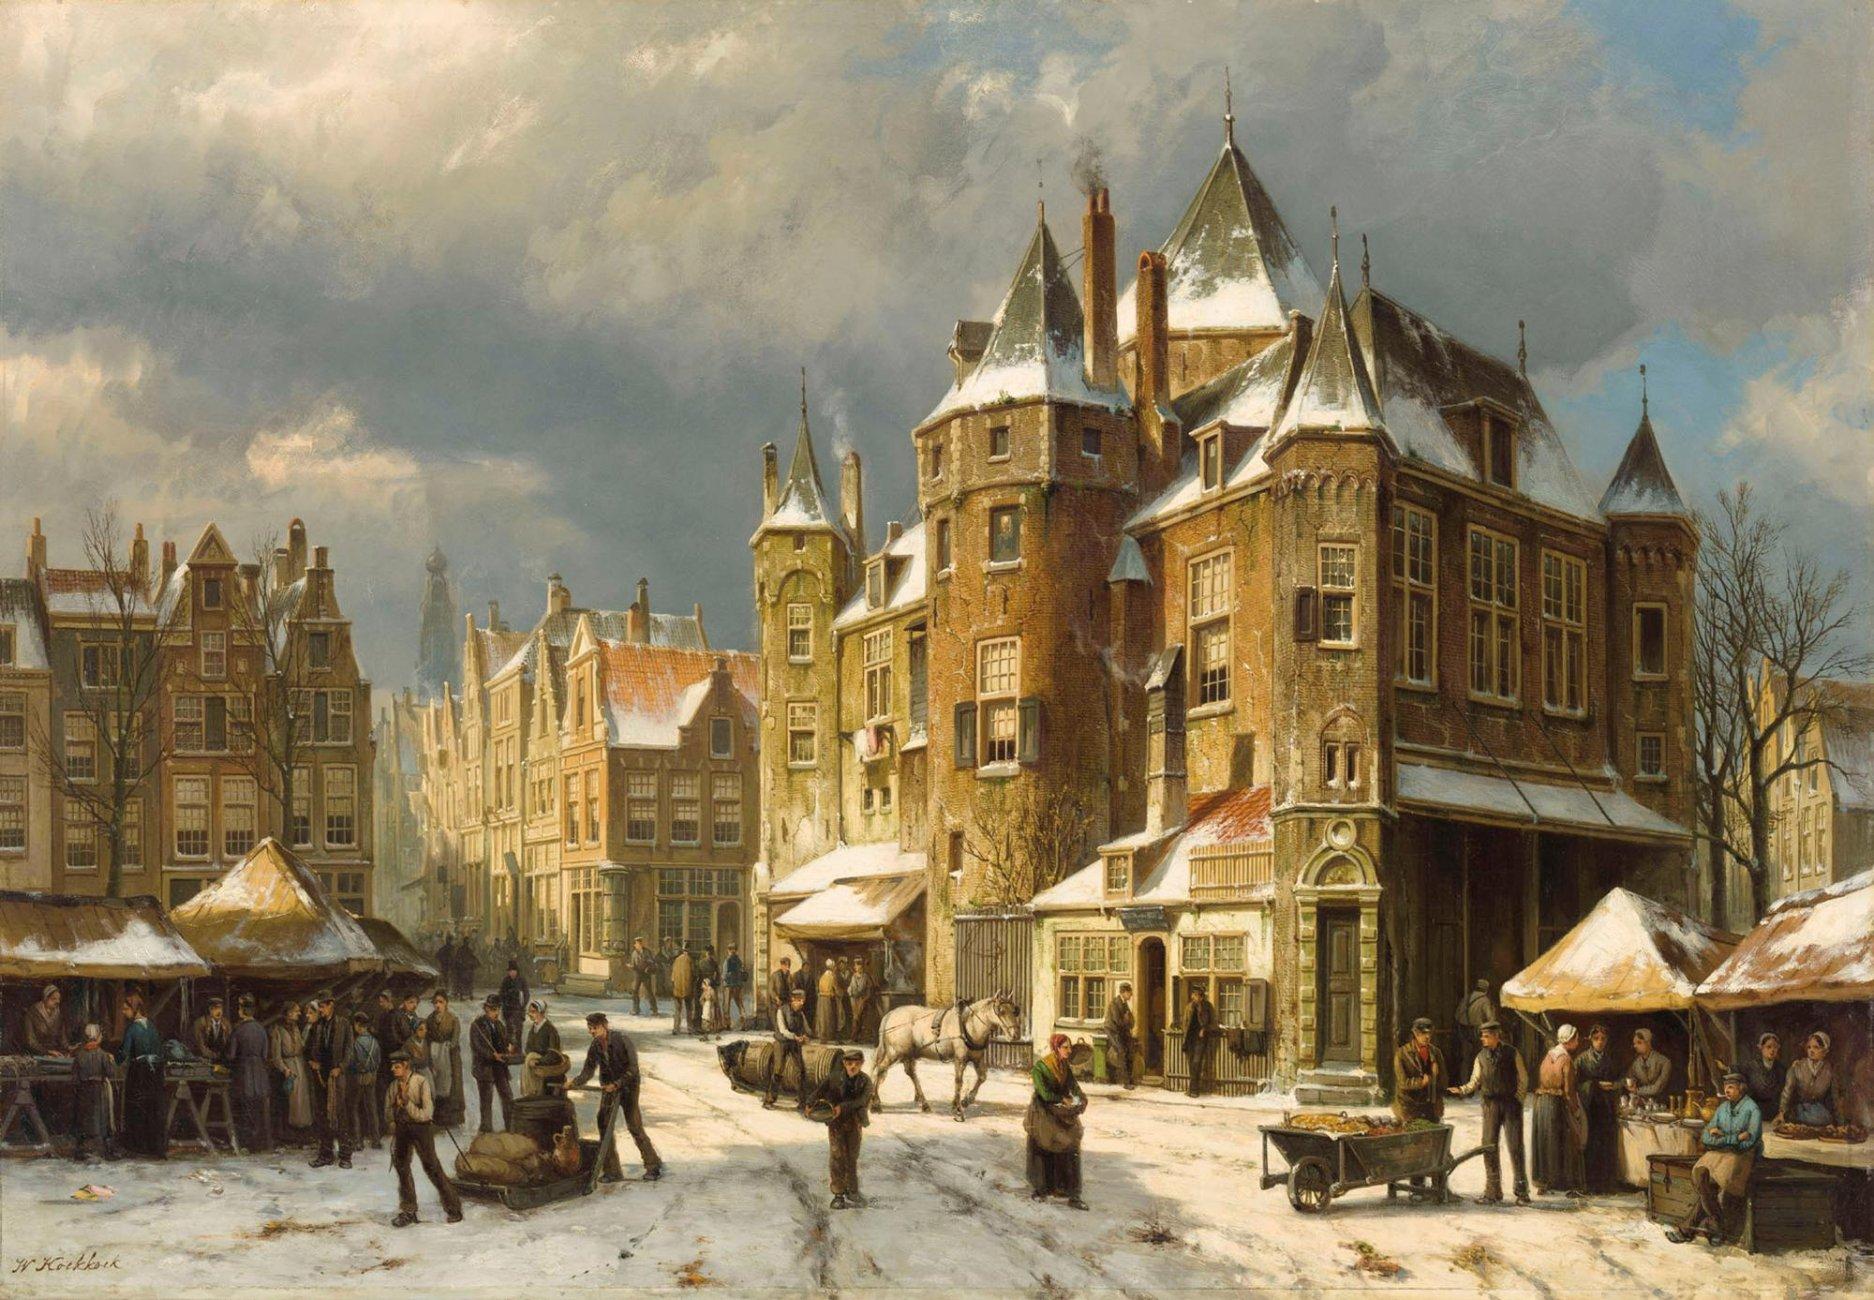 Willem-Koekkoek-theNieuwmarktinAmsterdaminWinter-1322014T132751.jpg